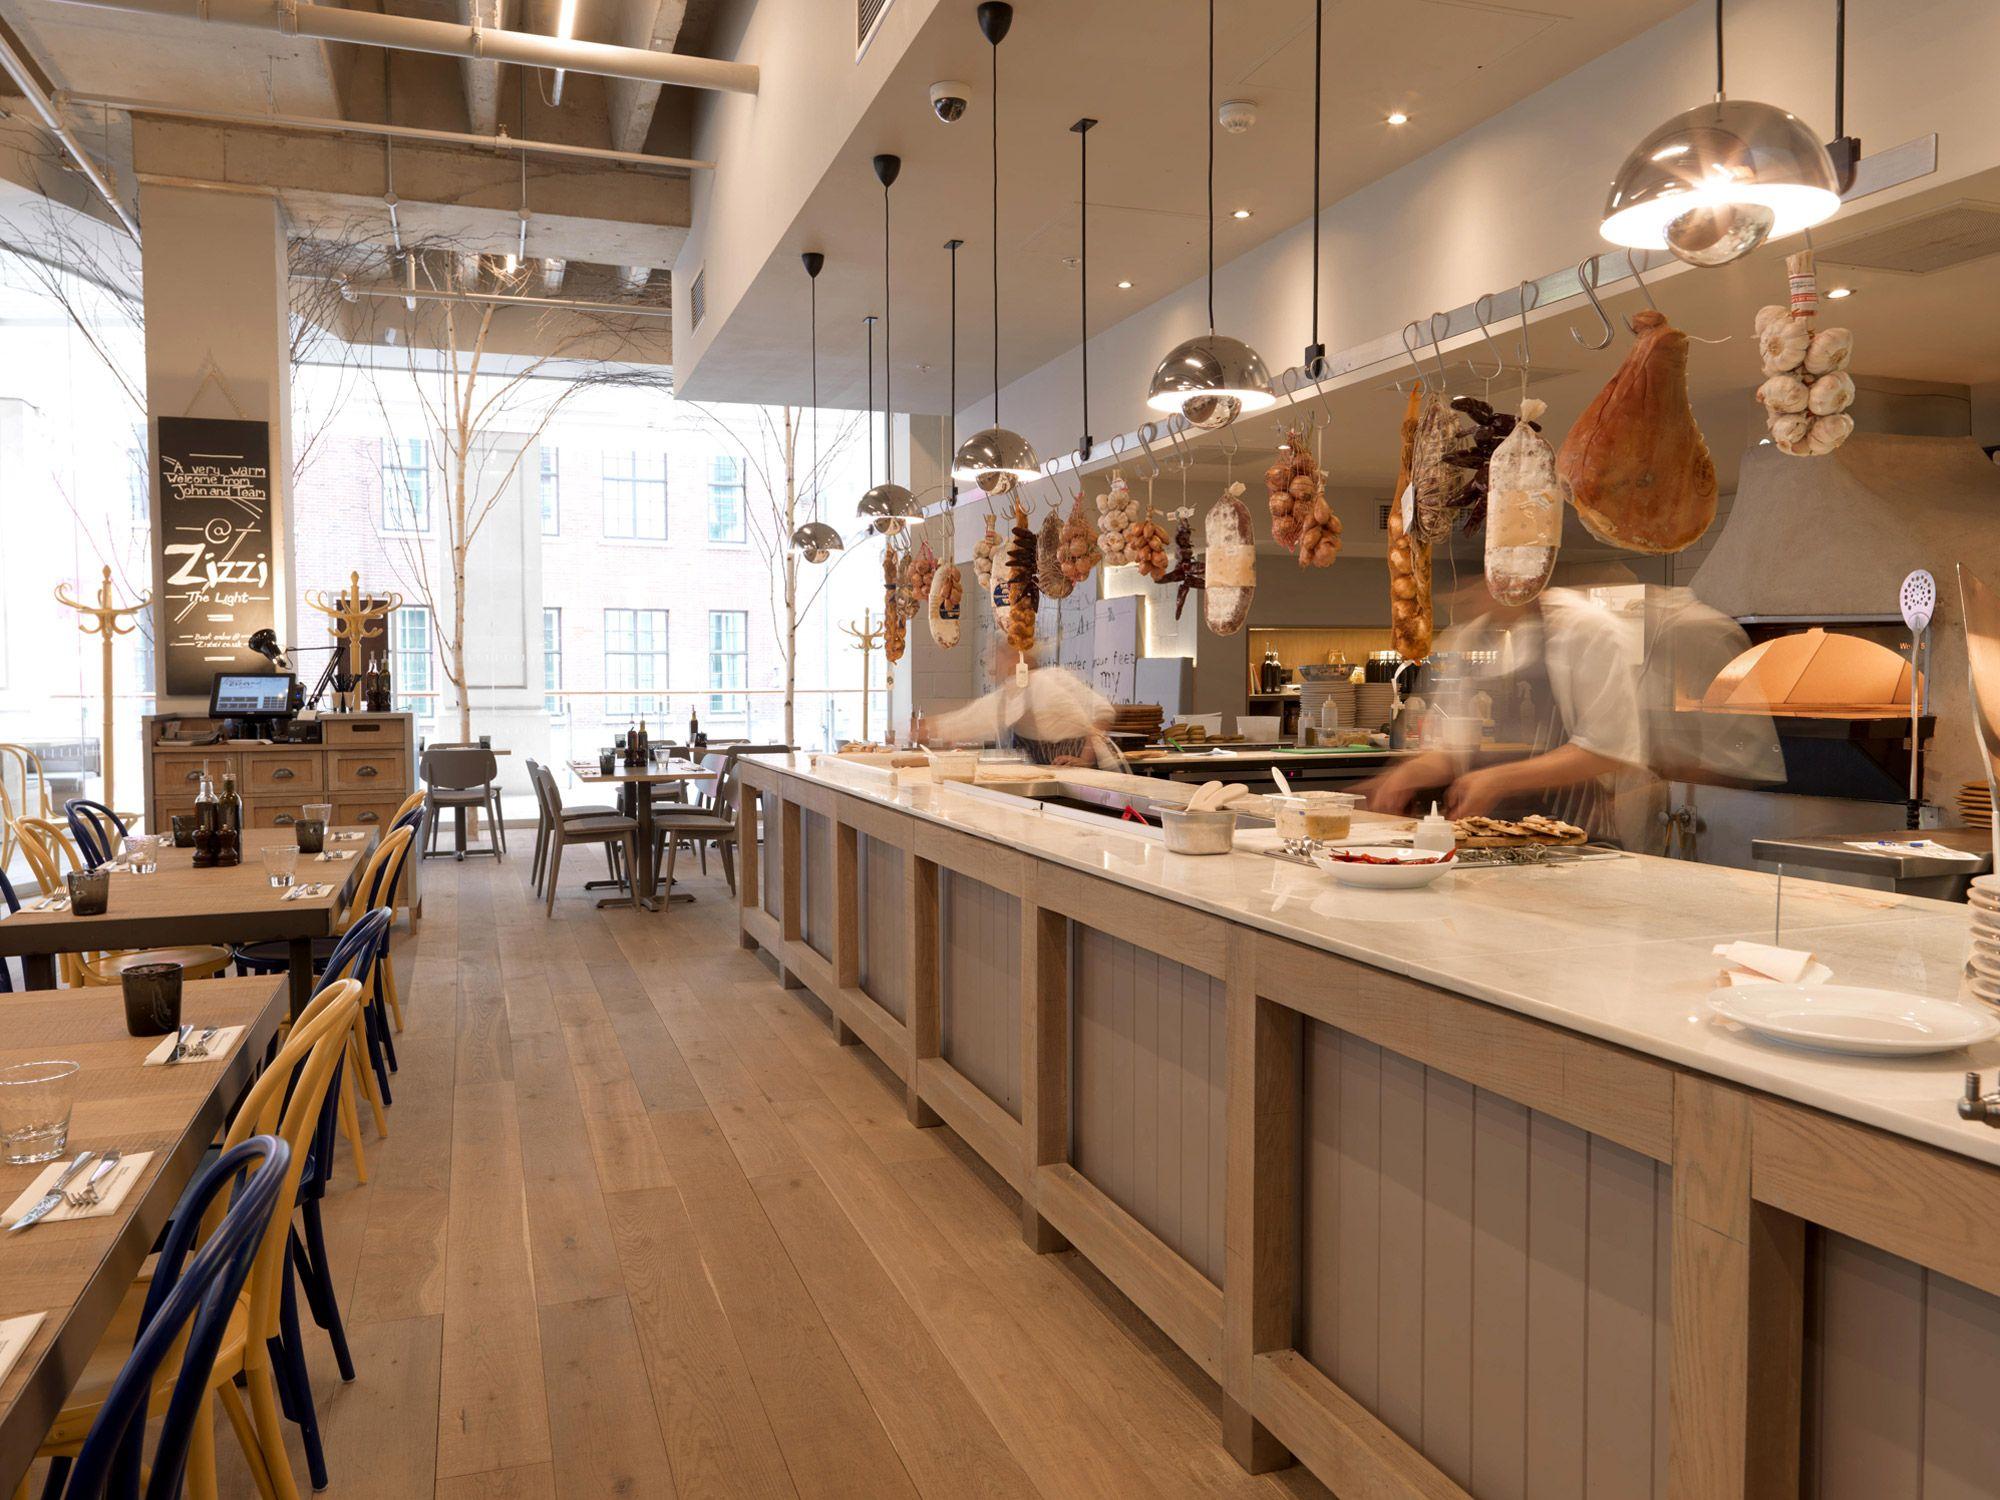 Zizzi leeds UK Expo kitchens Pinterest Italian restaurant